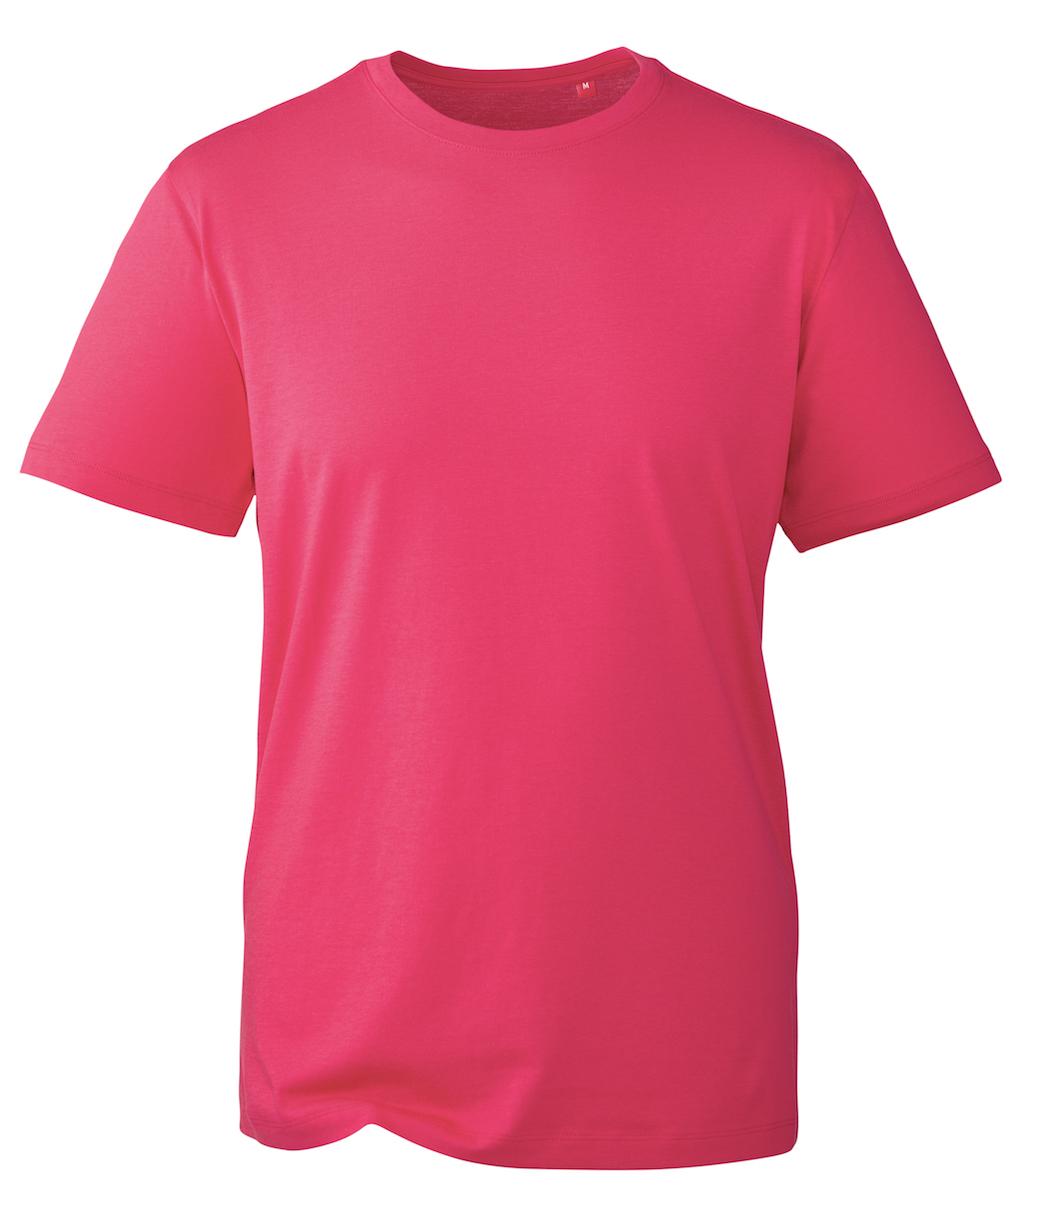 Anthem Hot Pink